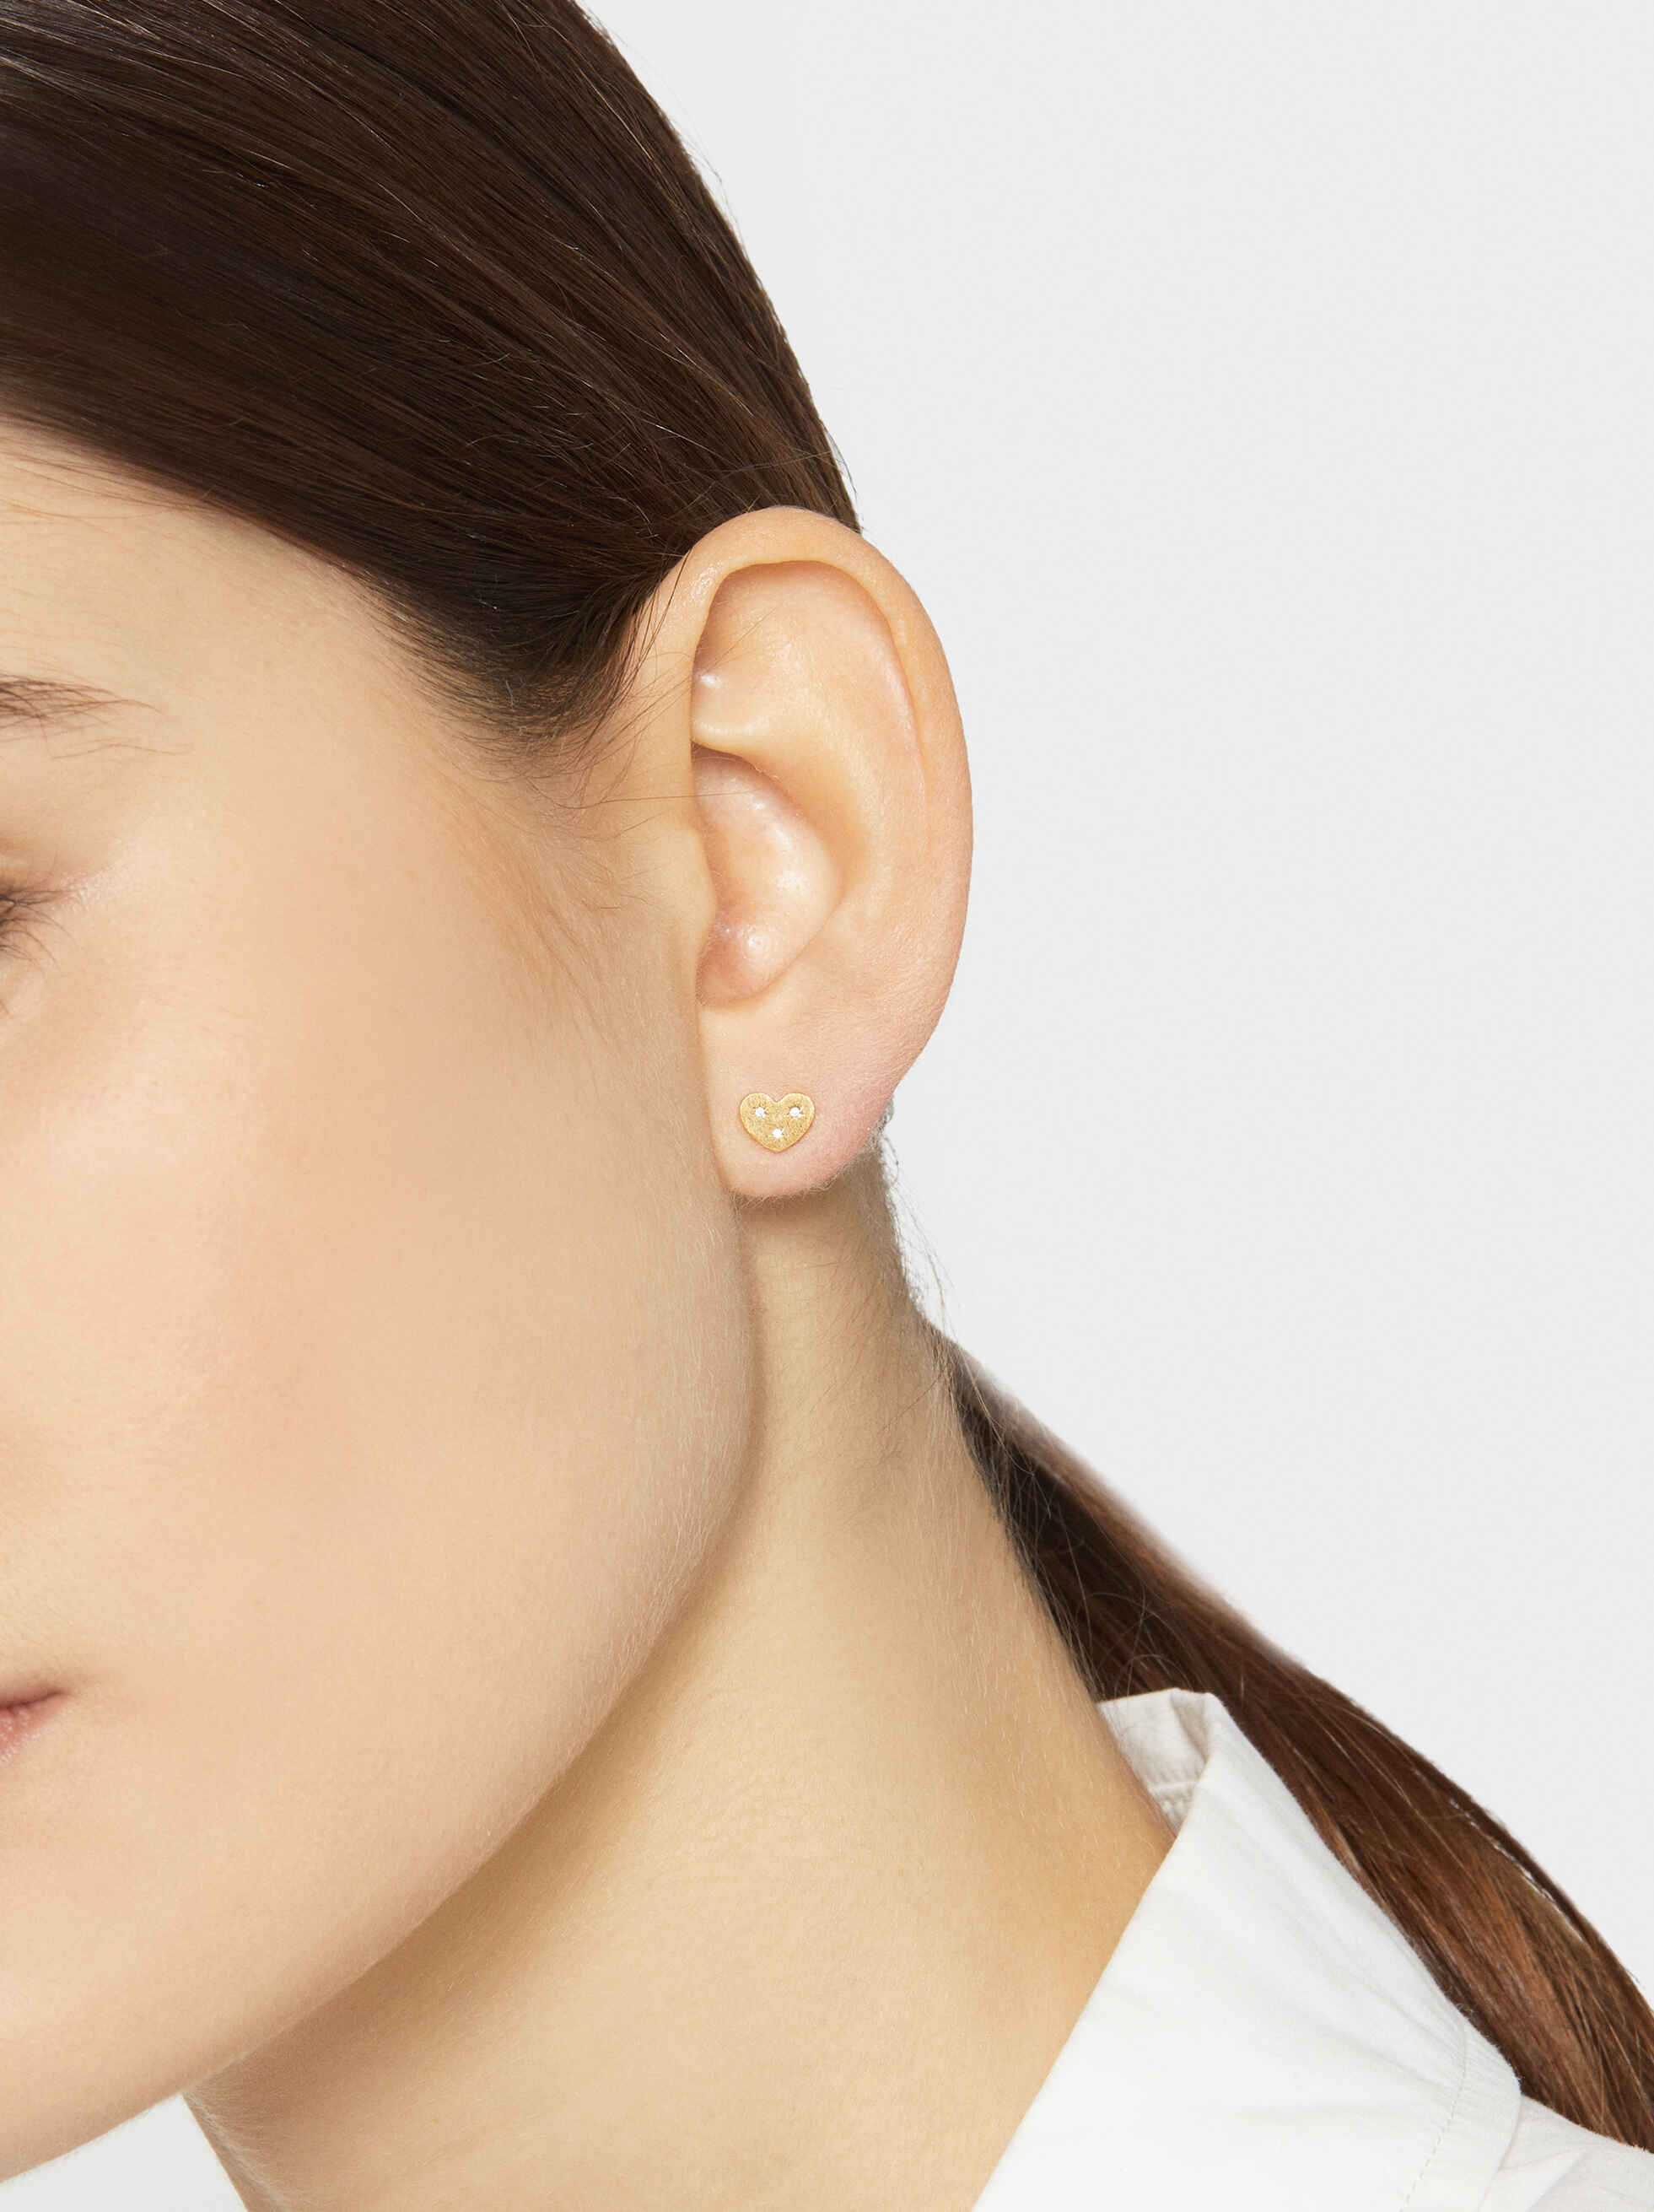 925 Silver Heart Stud Earrings, Golden, hi-res